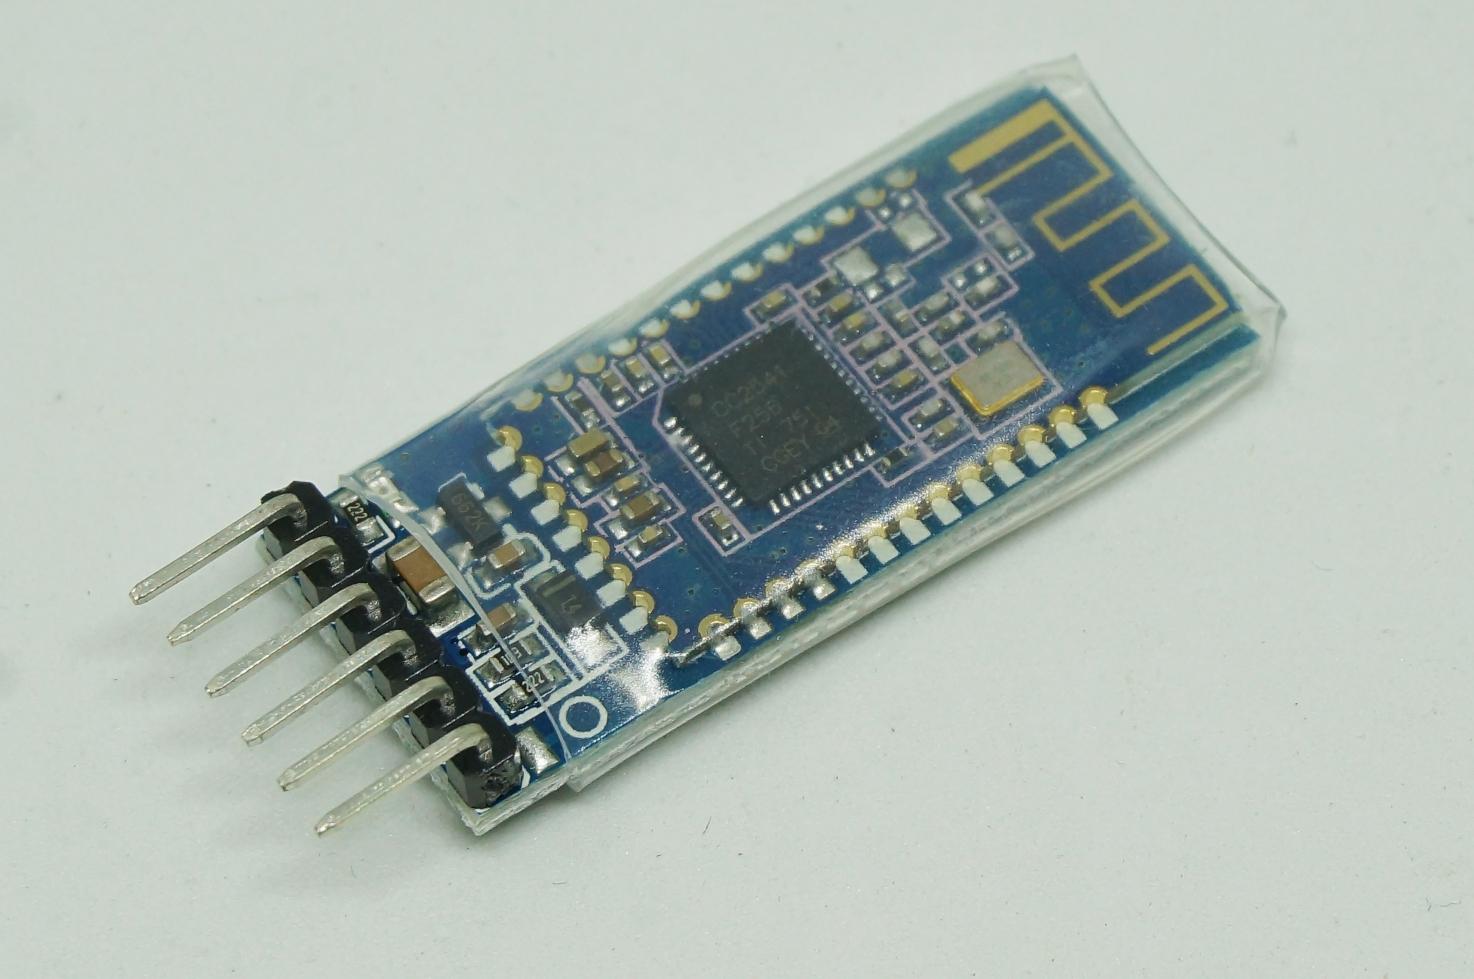 AT-09 BLE 4.0 bluetooth module (compatible HM-10)